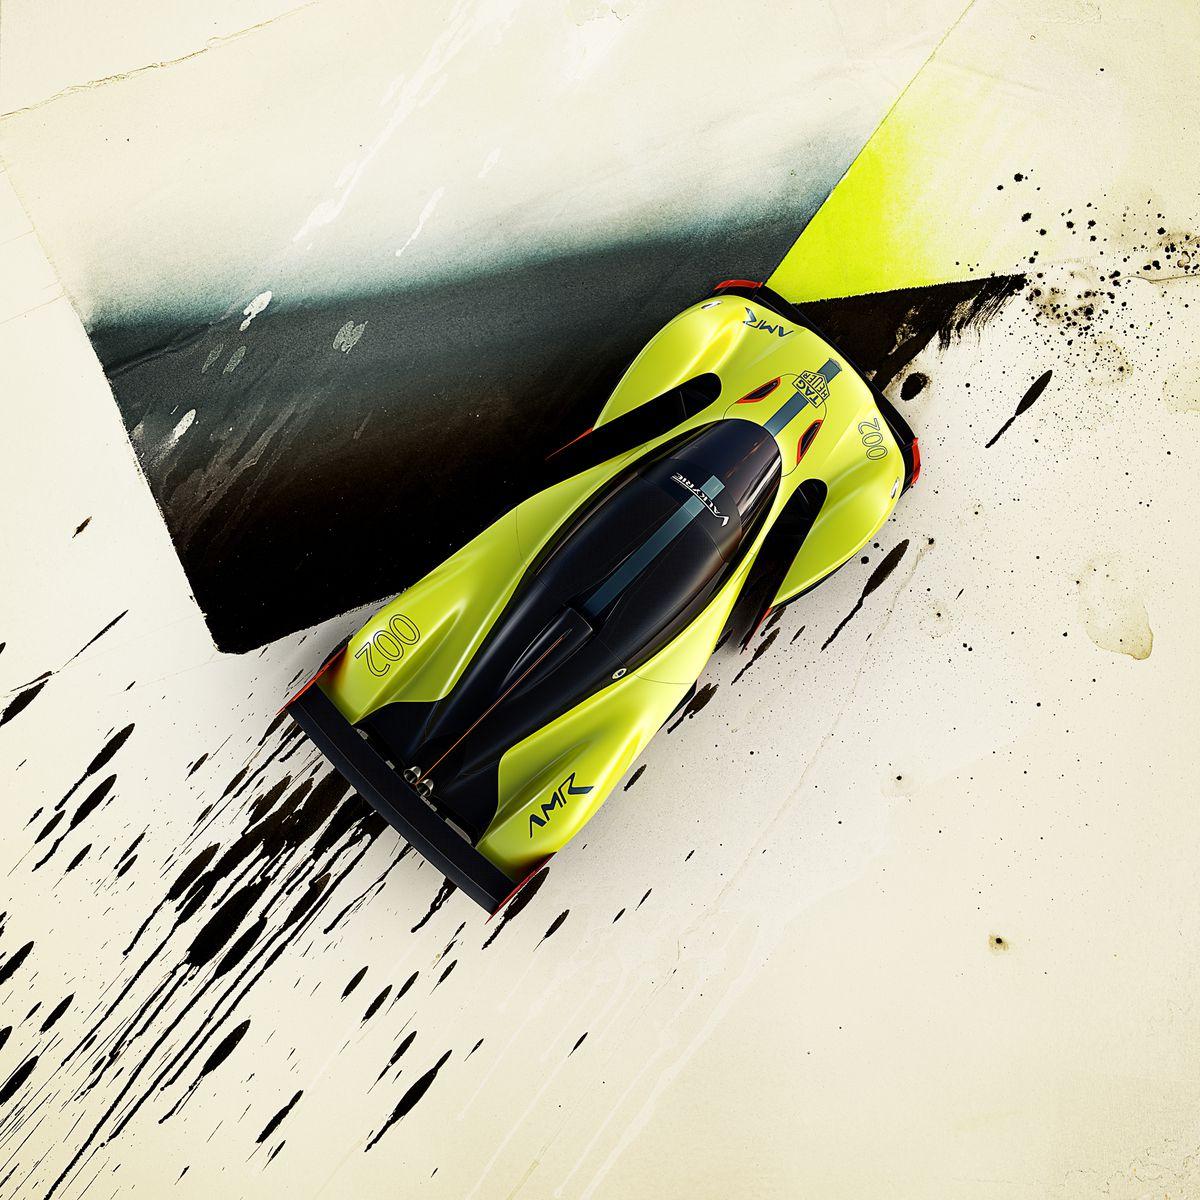 Aston Martin Valkyrie Amr Pro: Aston Martin's New Hypercar Is An 1,100 Horsepower Asphalt